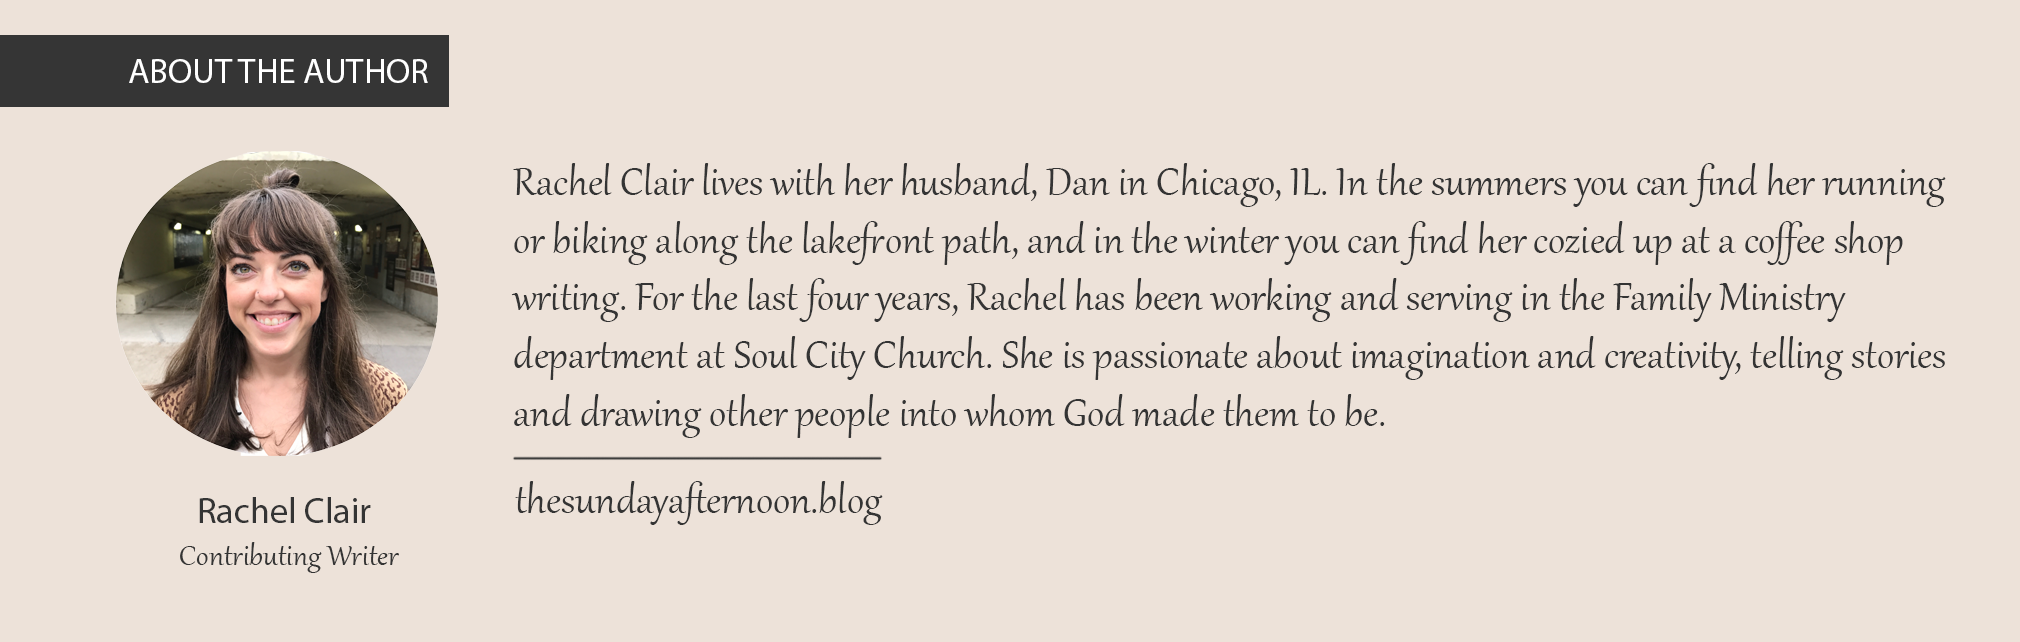 Rachel Clair bio.png